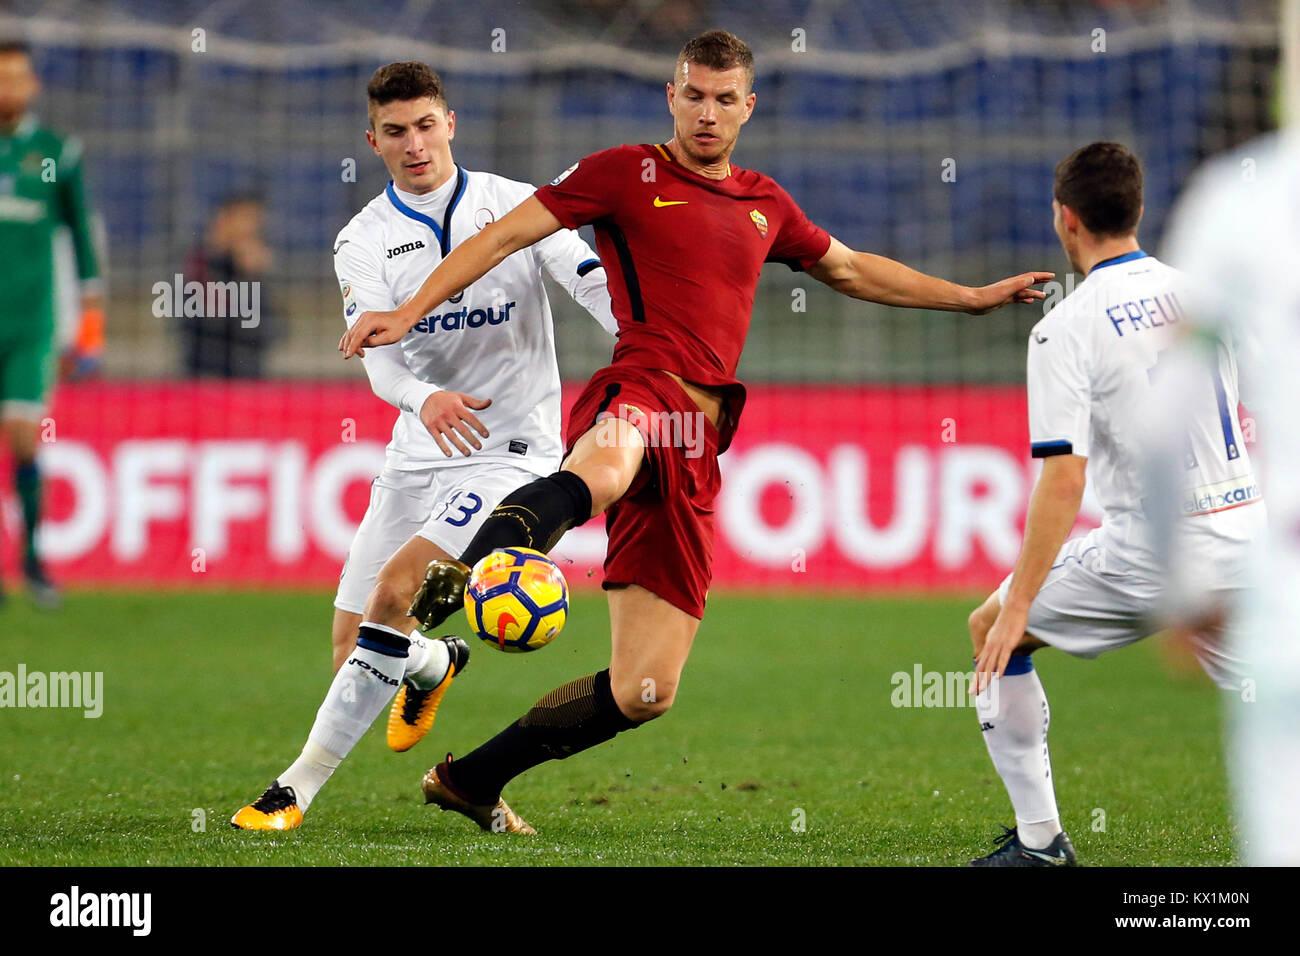 Olympic Stadium, ROME, Italy - 06/01/2018  (L-R) Mattia Caldara of Atalanta and Edin Dzeko of Roma fight for the - Stock Image